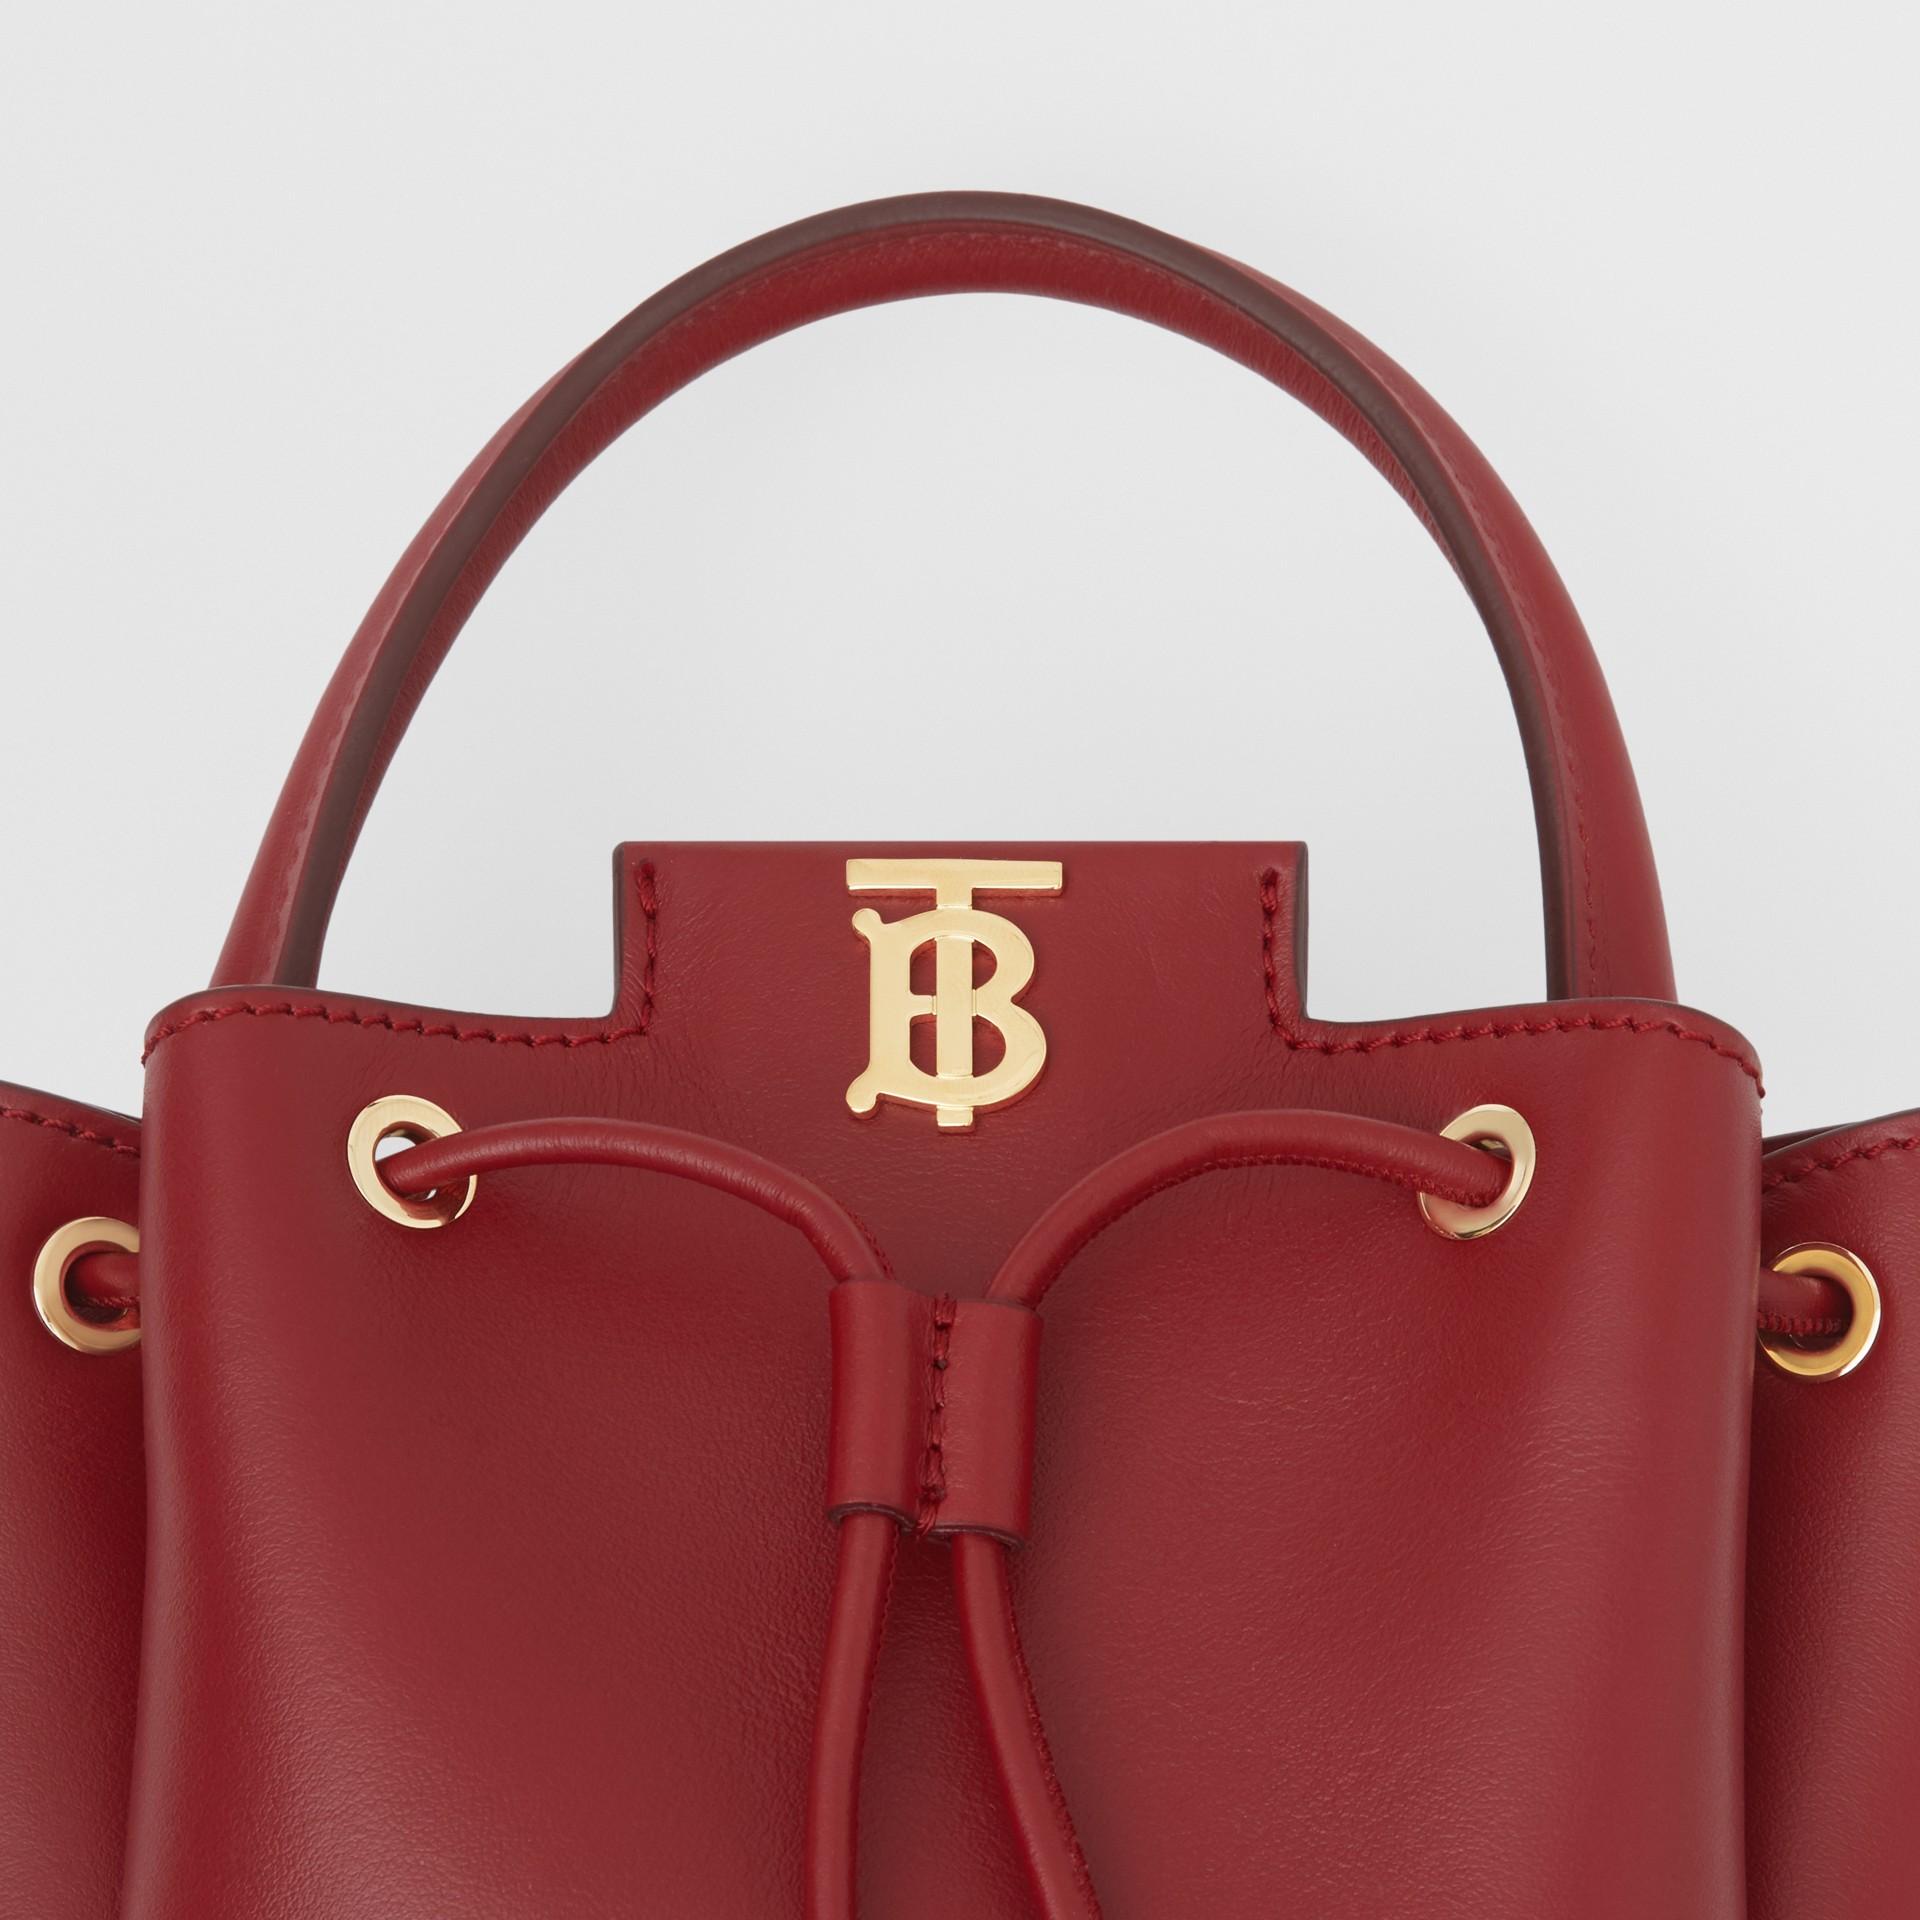 Monogram Motif Leather Bucket Bag in Dark Carmine - Women | Burberry United States - gallery image 1